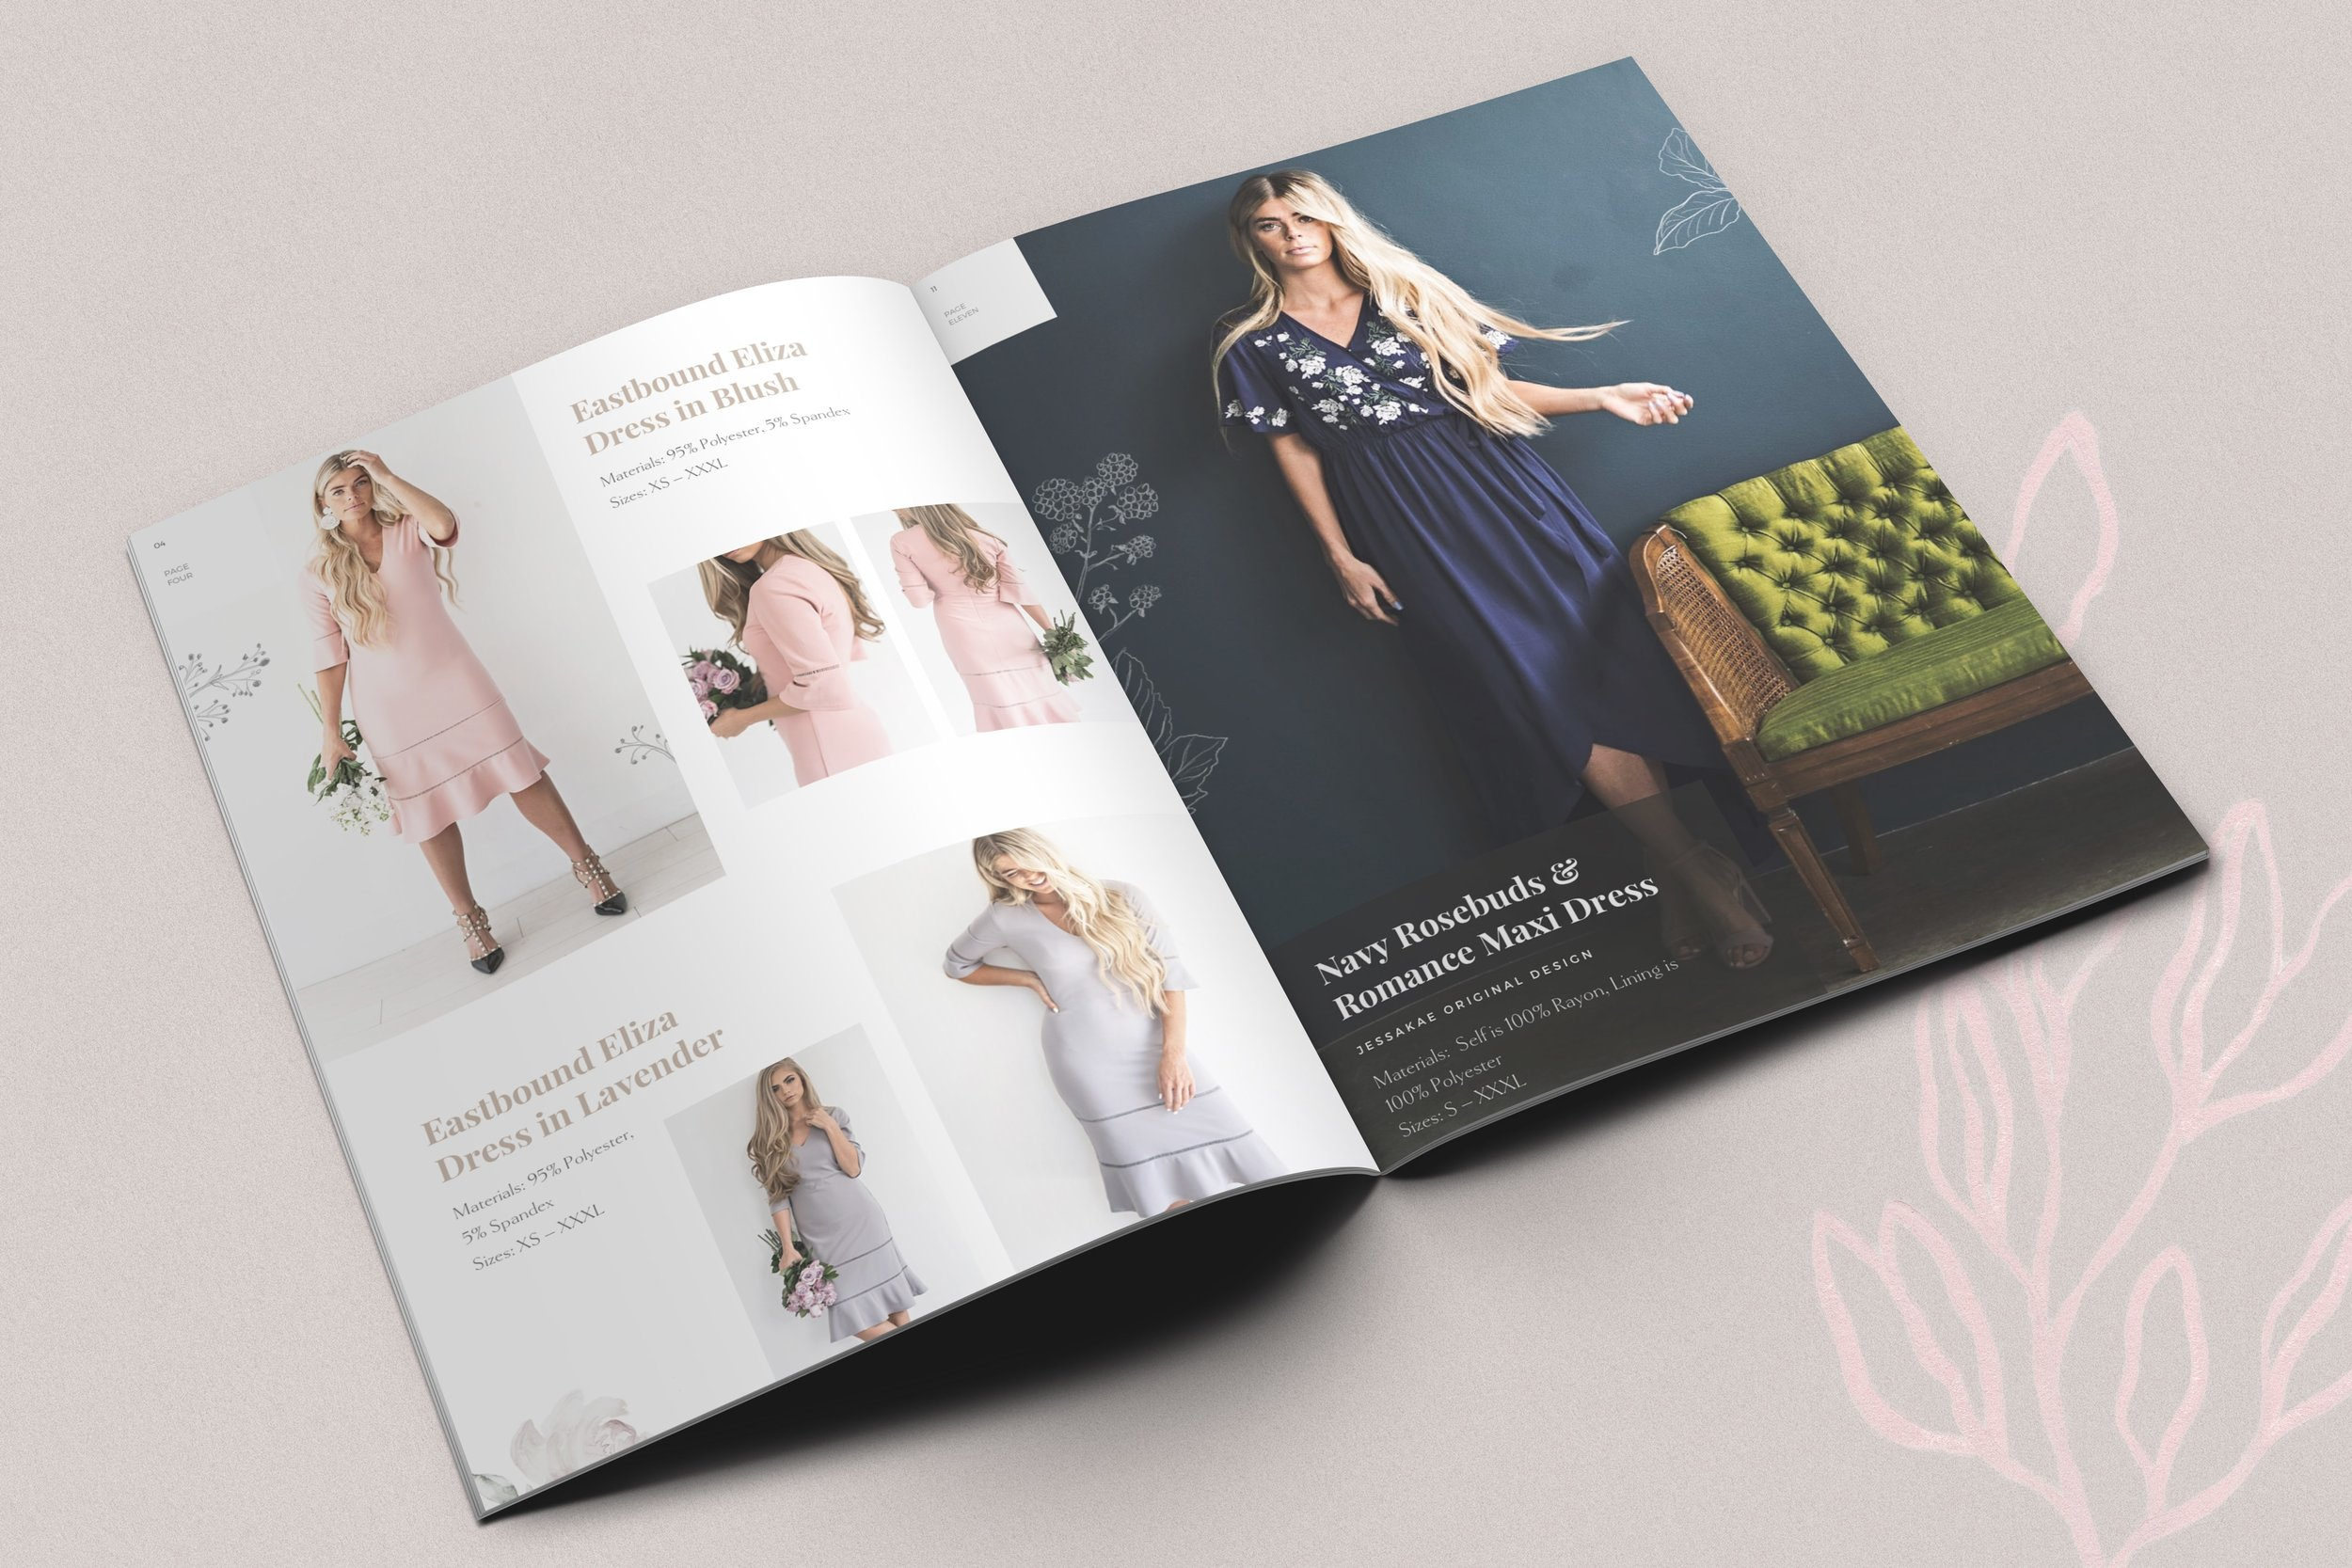 lookbook-design-3-min.jpg